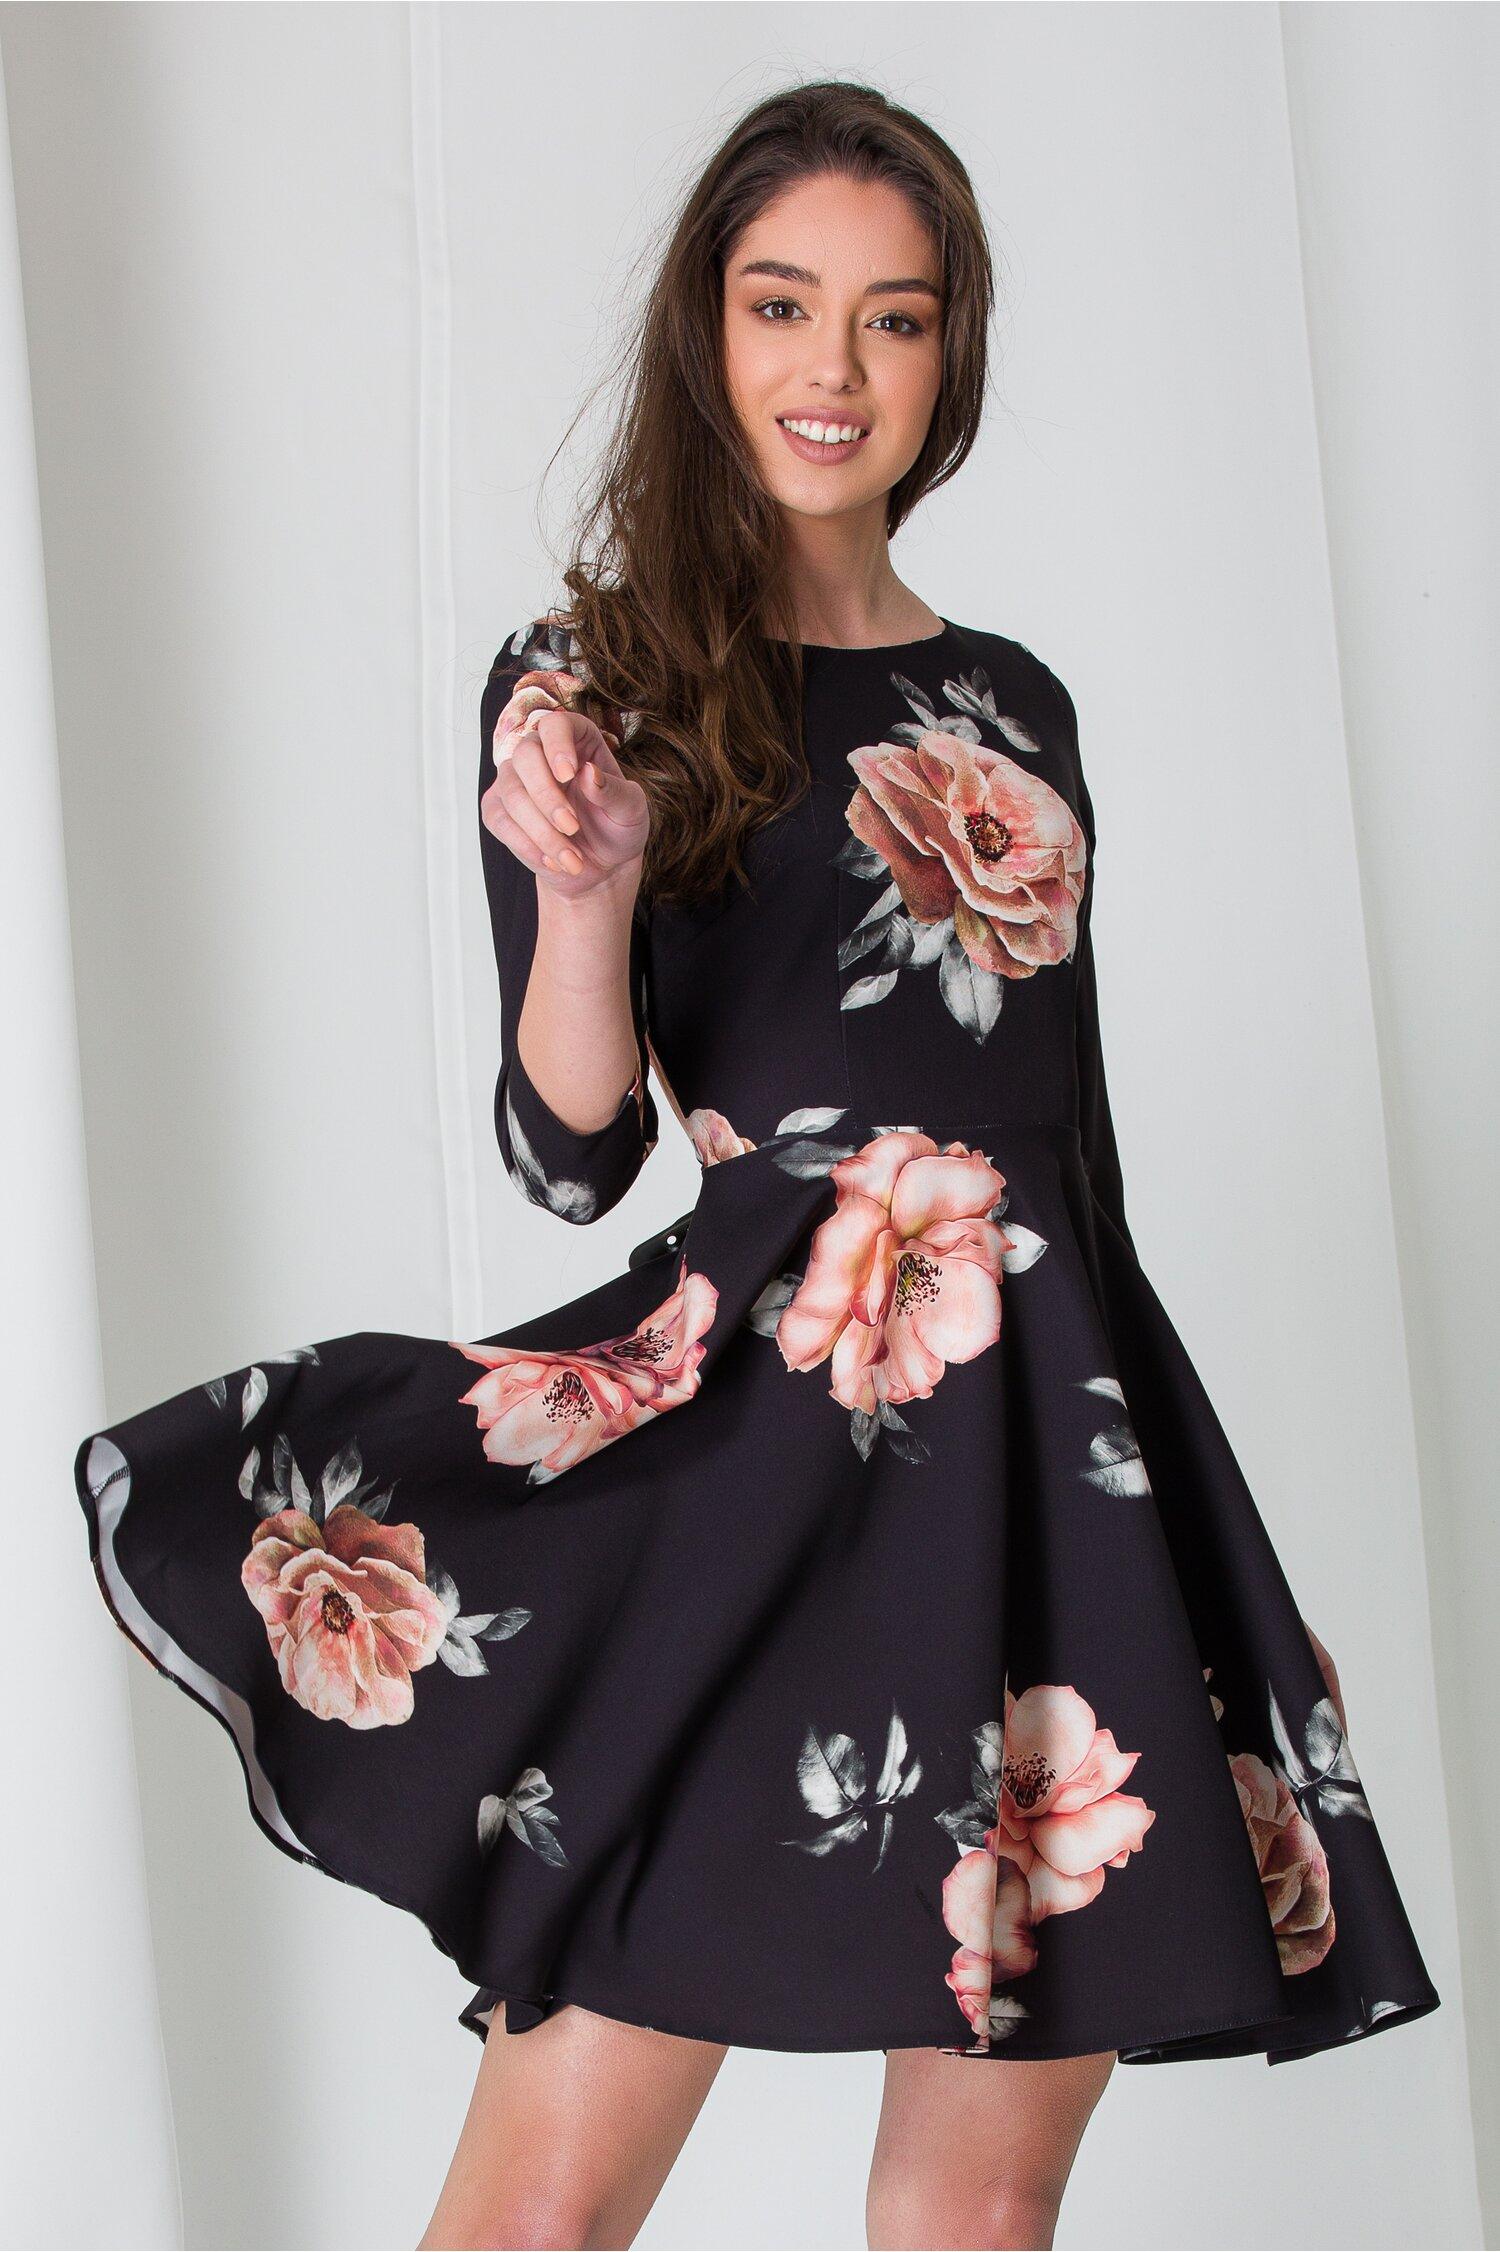 Rochie Bella neagra cu trandafiri imagine dyfashion.ro 2021